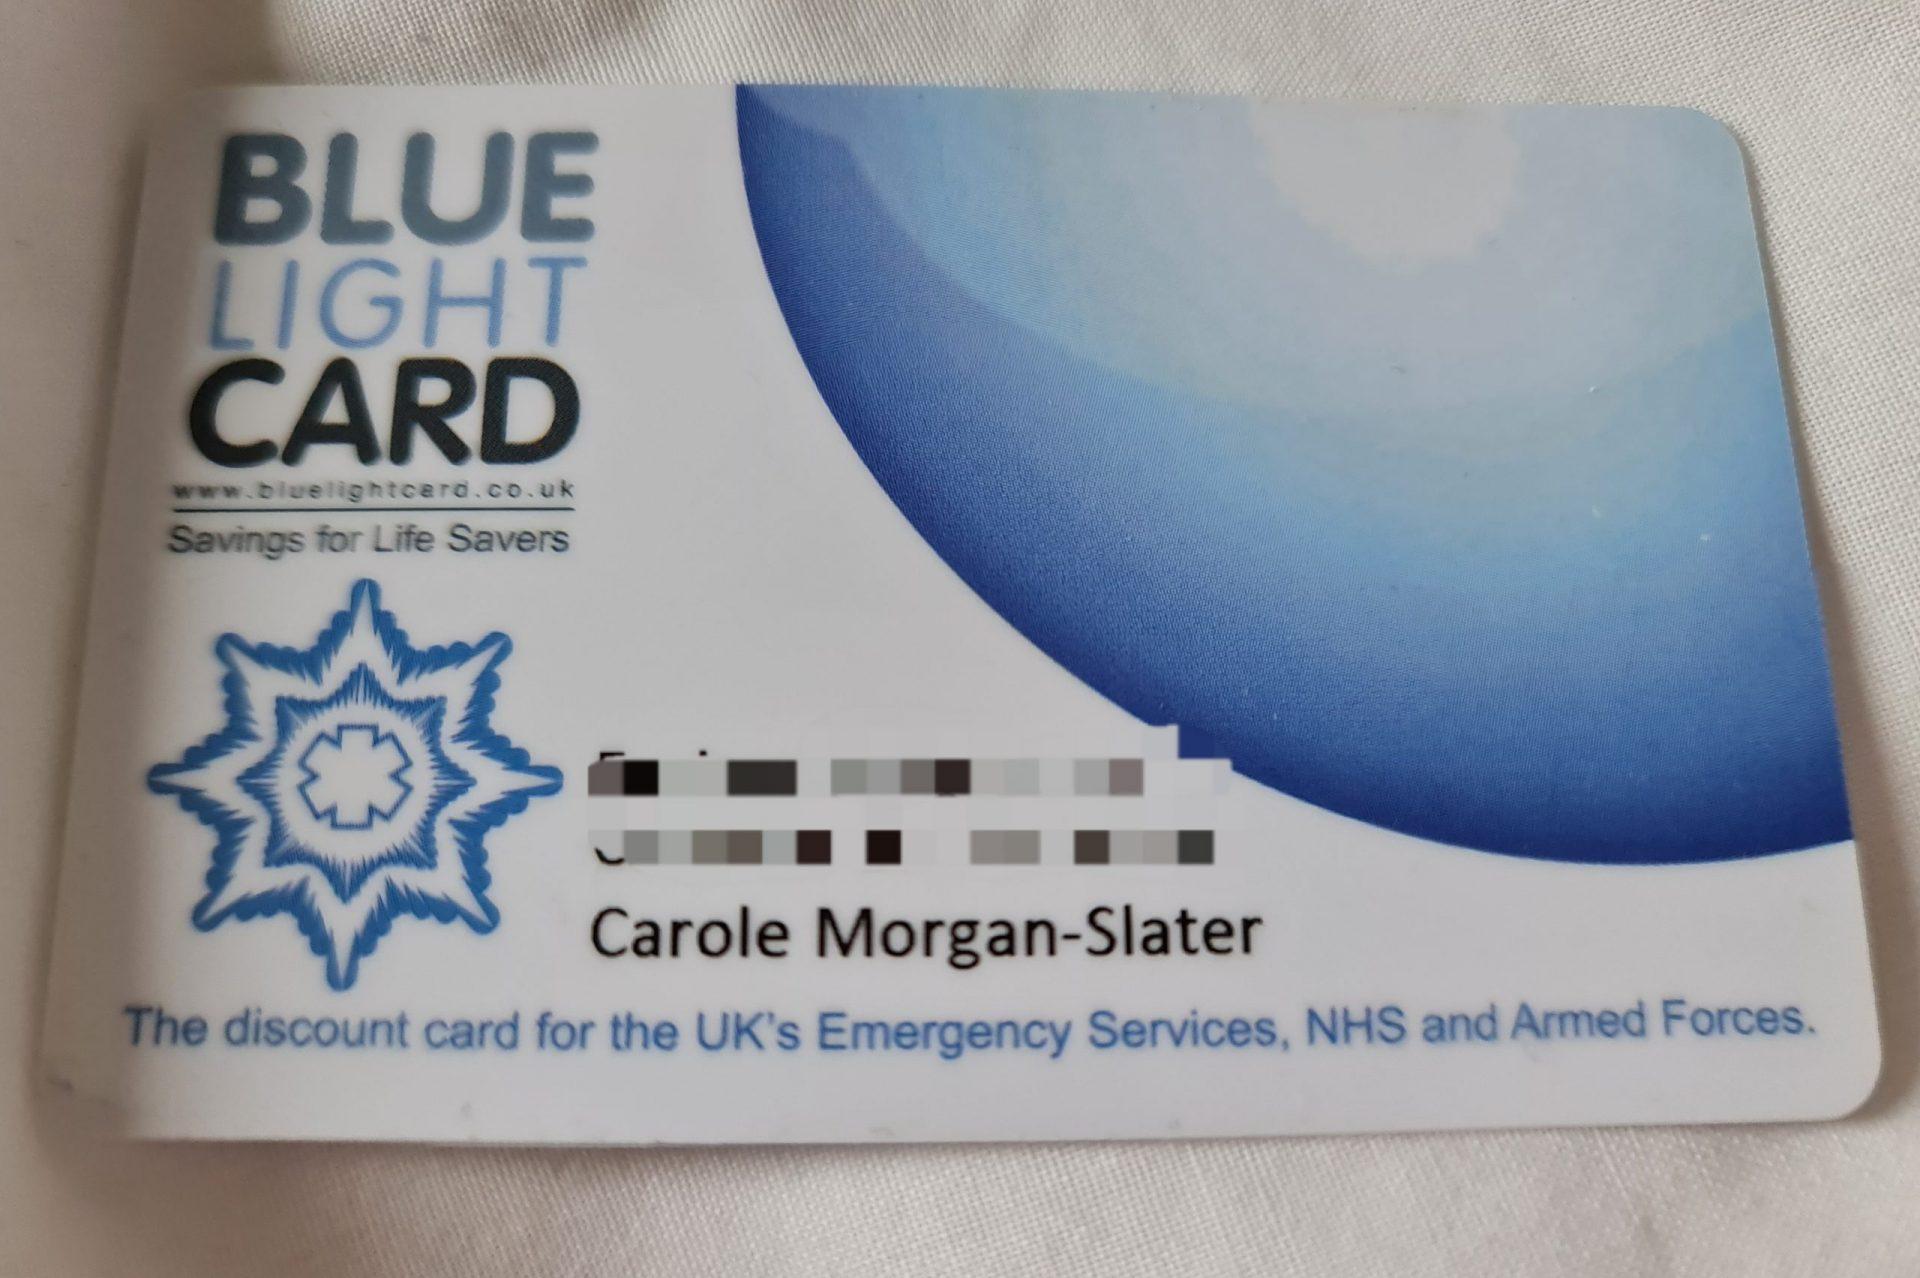 Blue Light Card save money on cruises discounts